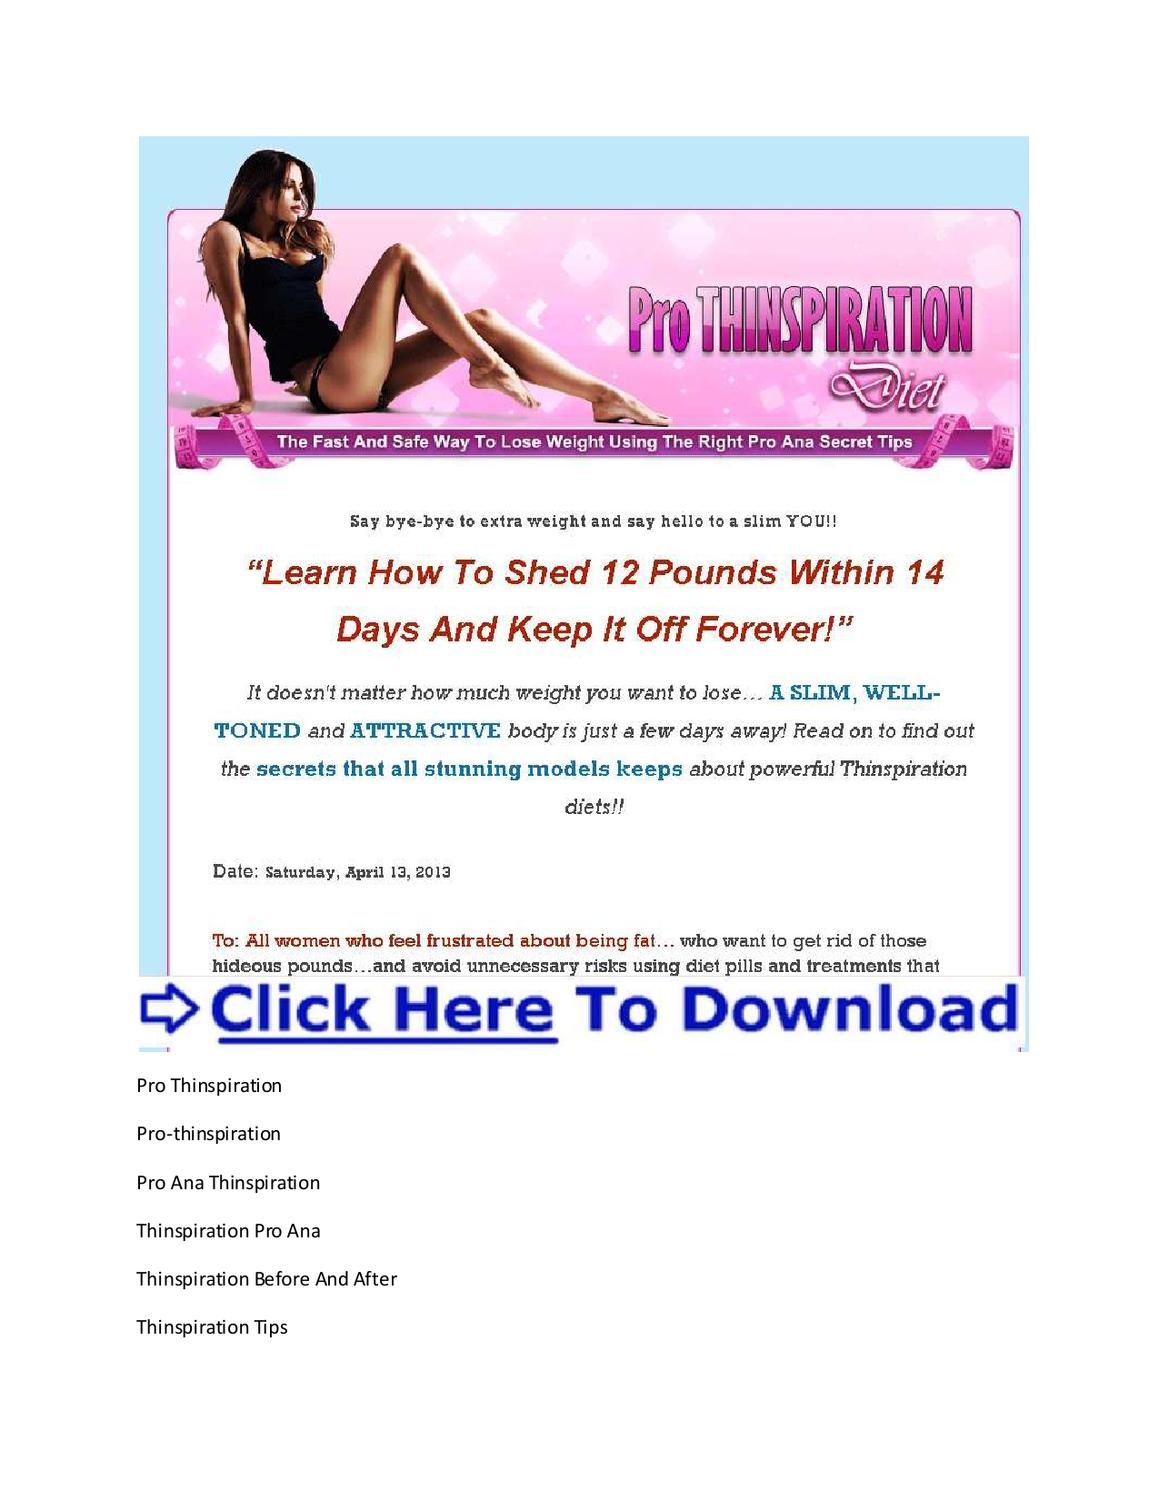 Thinspiration Weight Loss + Pro Ana Thinspiration Before